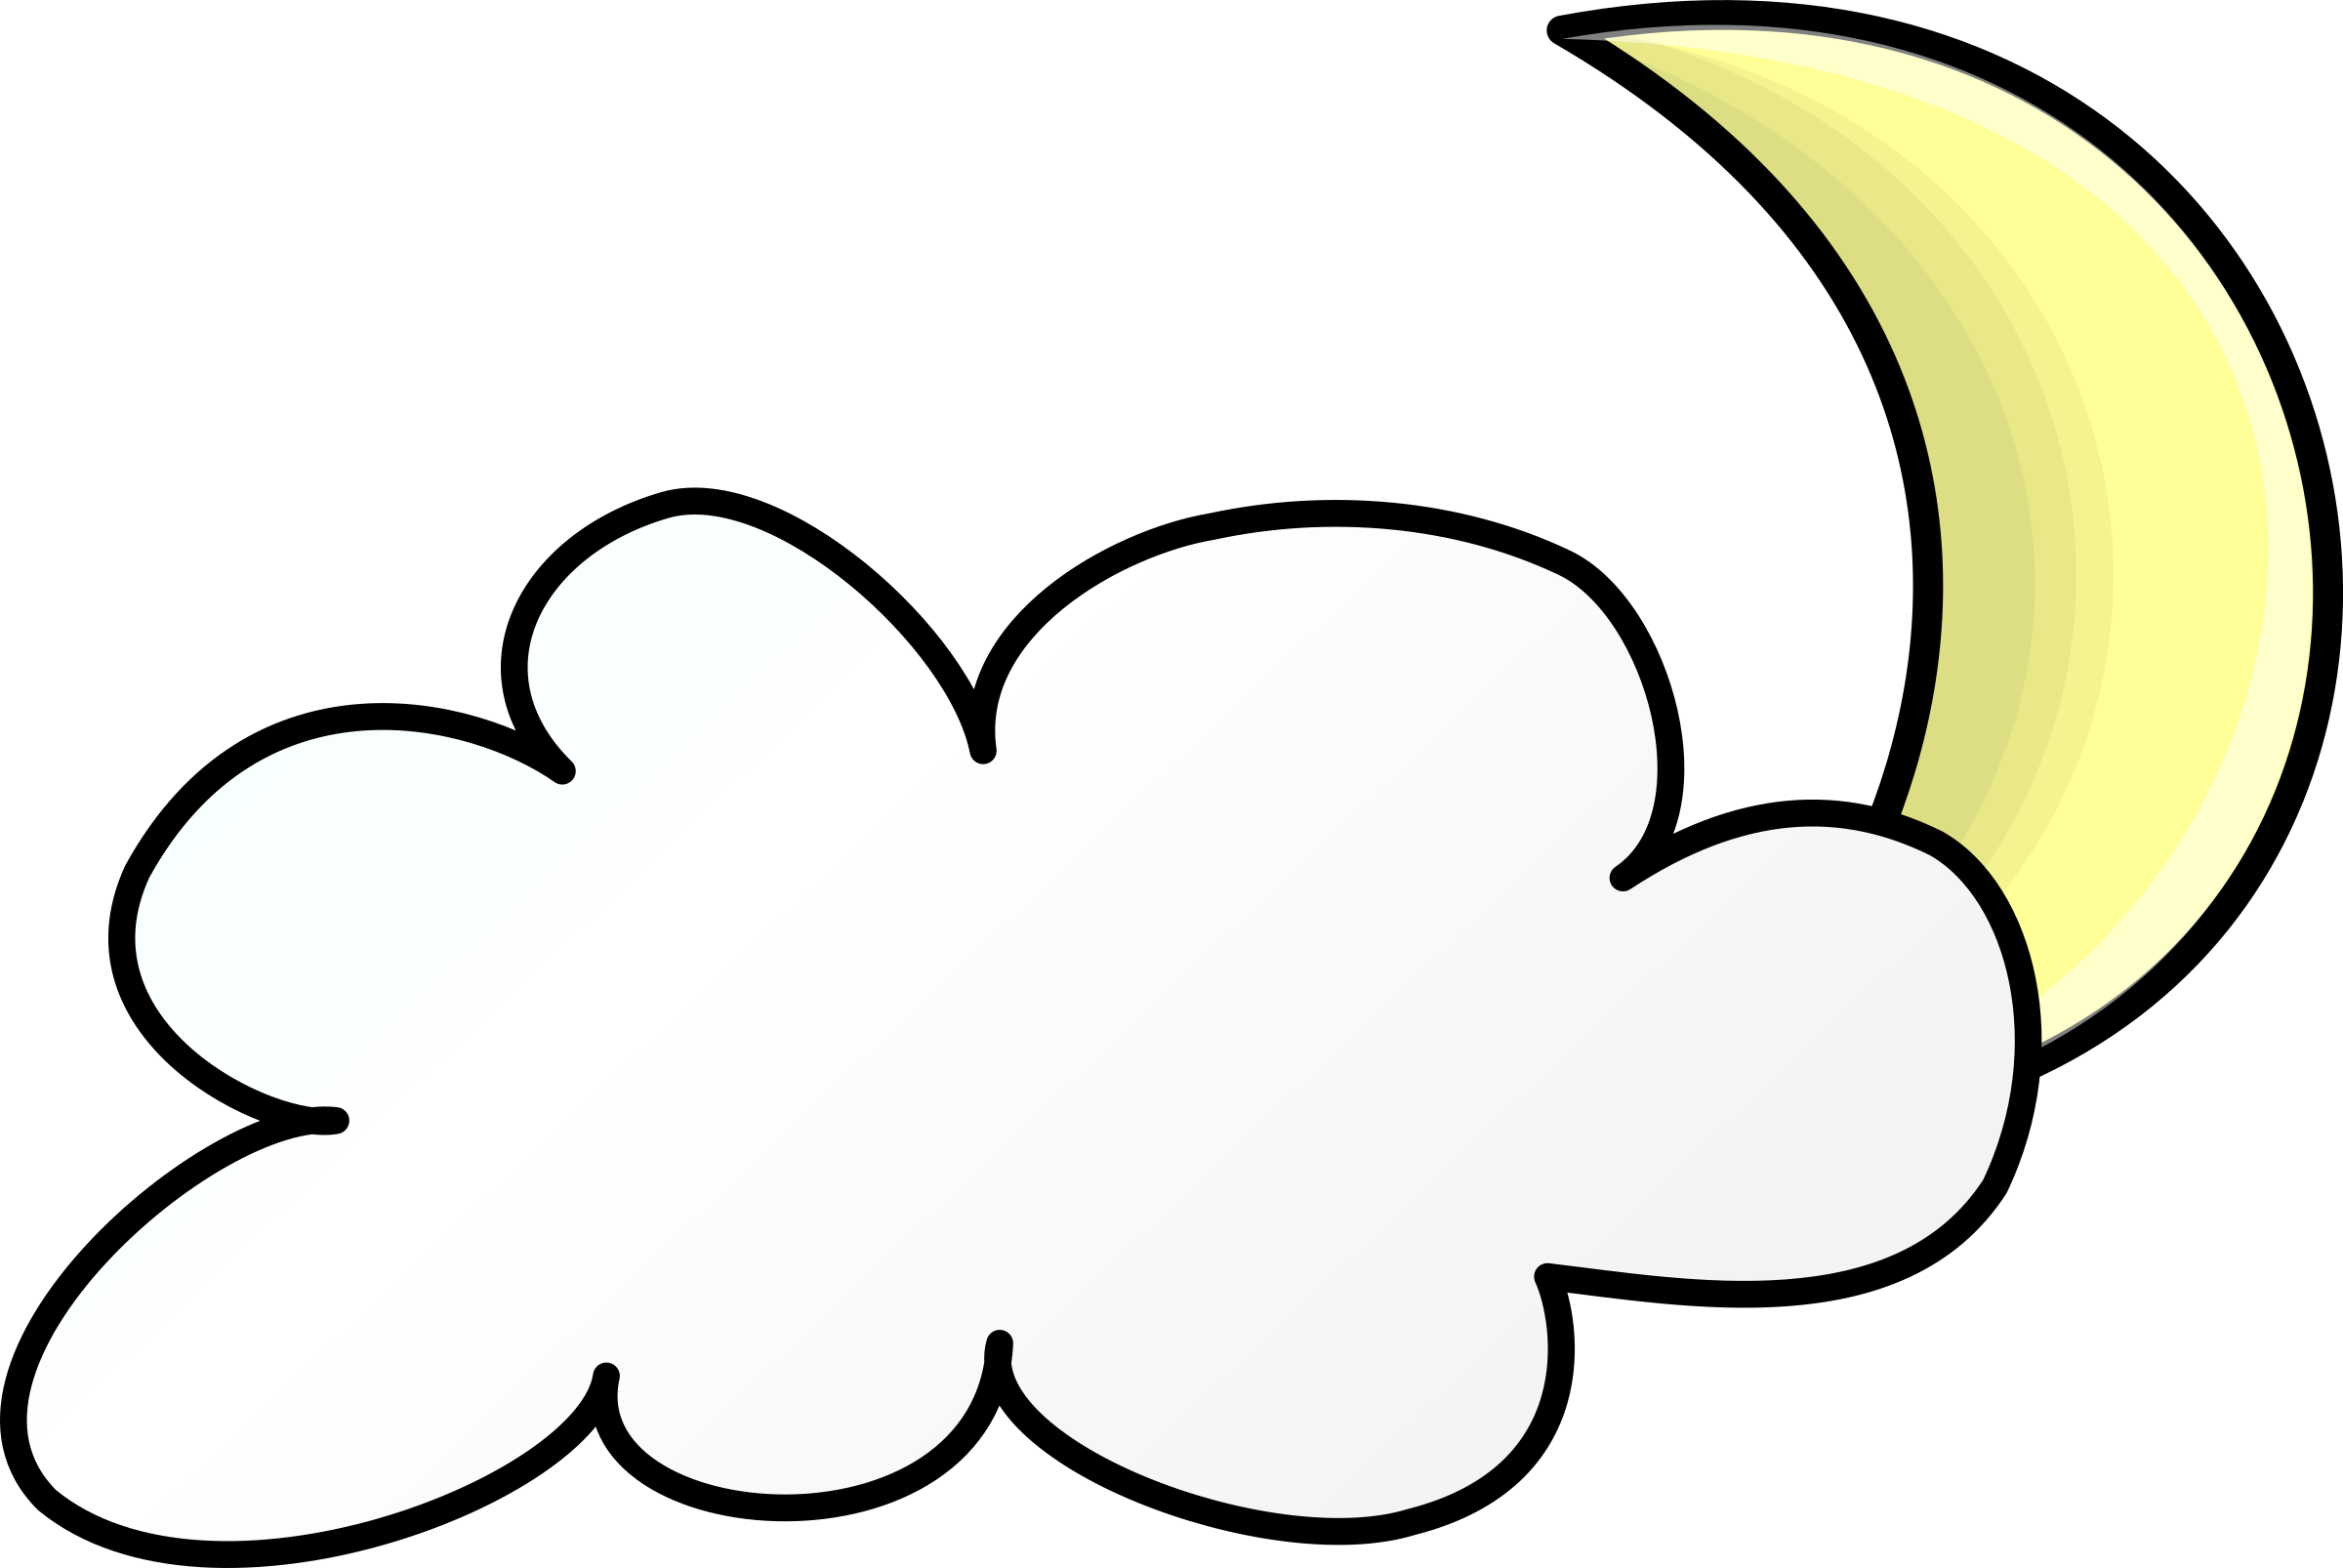 Night clipart transparent. Weather symbols cloudy big